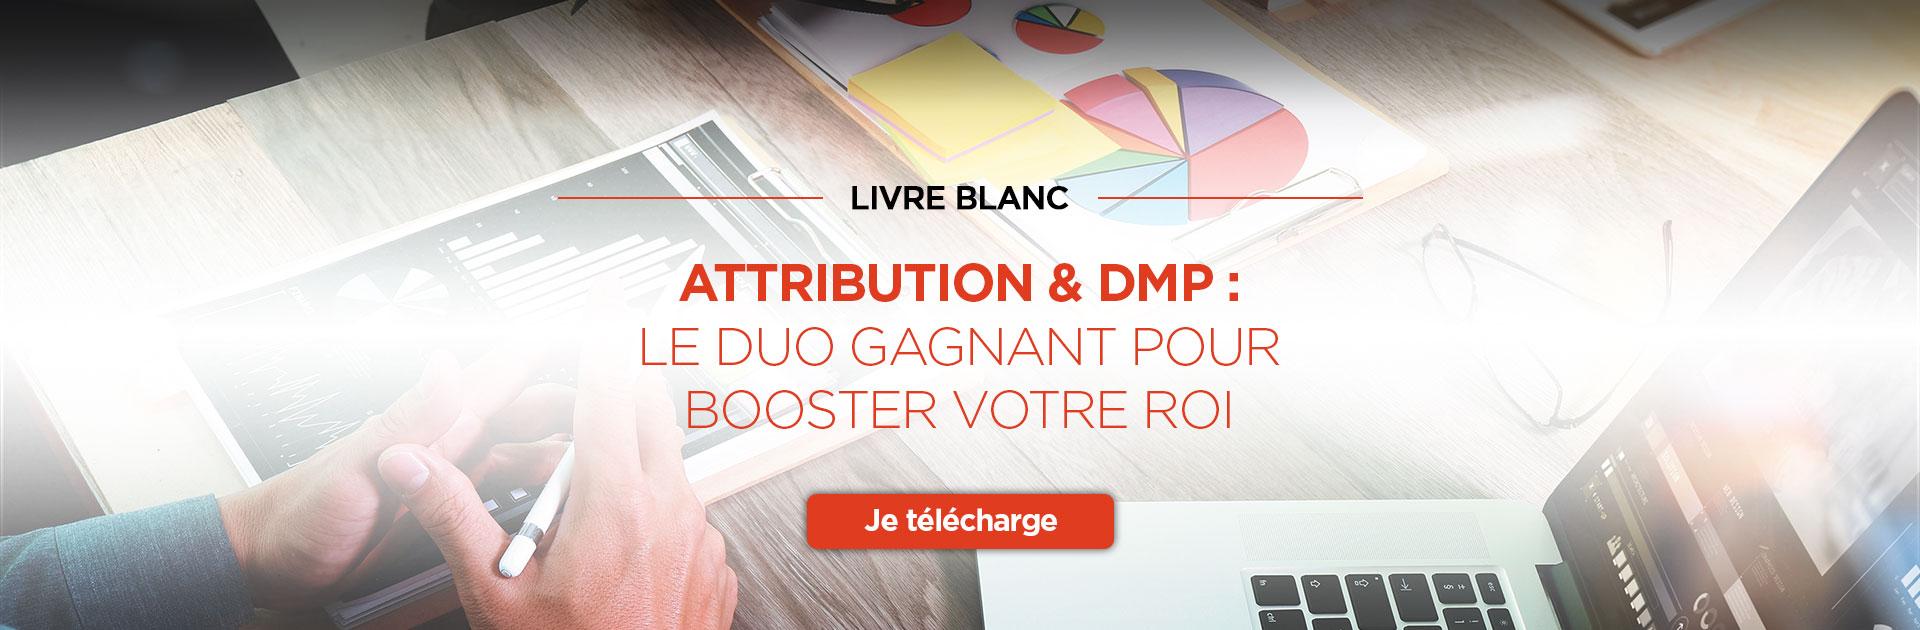 Livre Blanc : Attribution & DMP